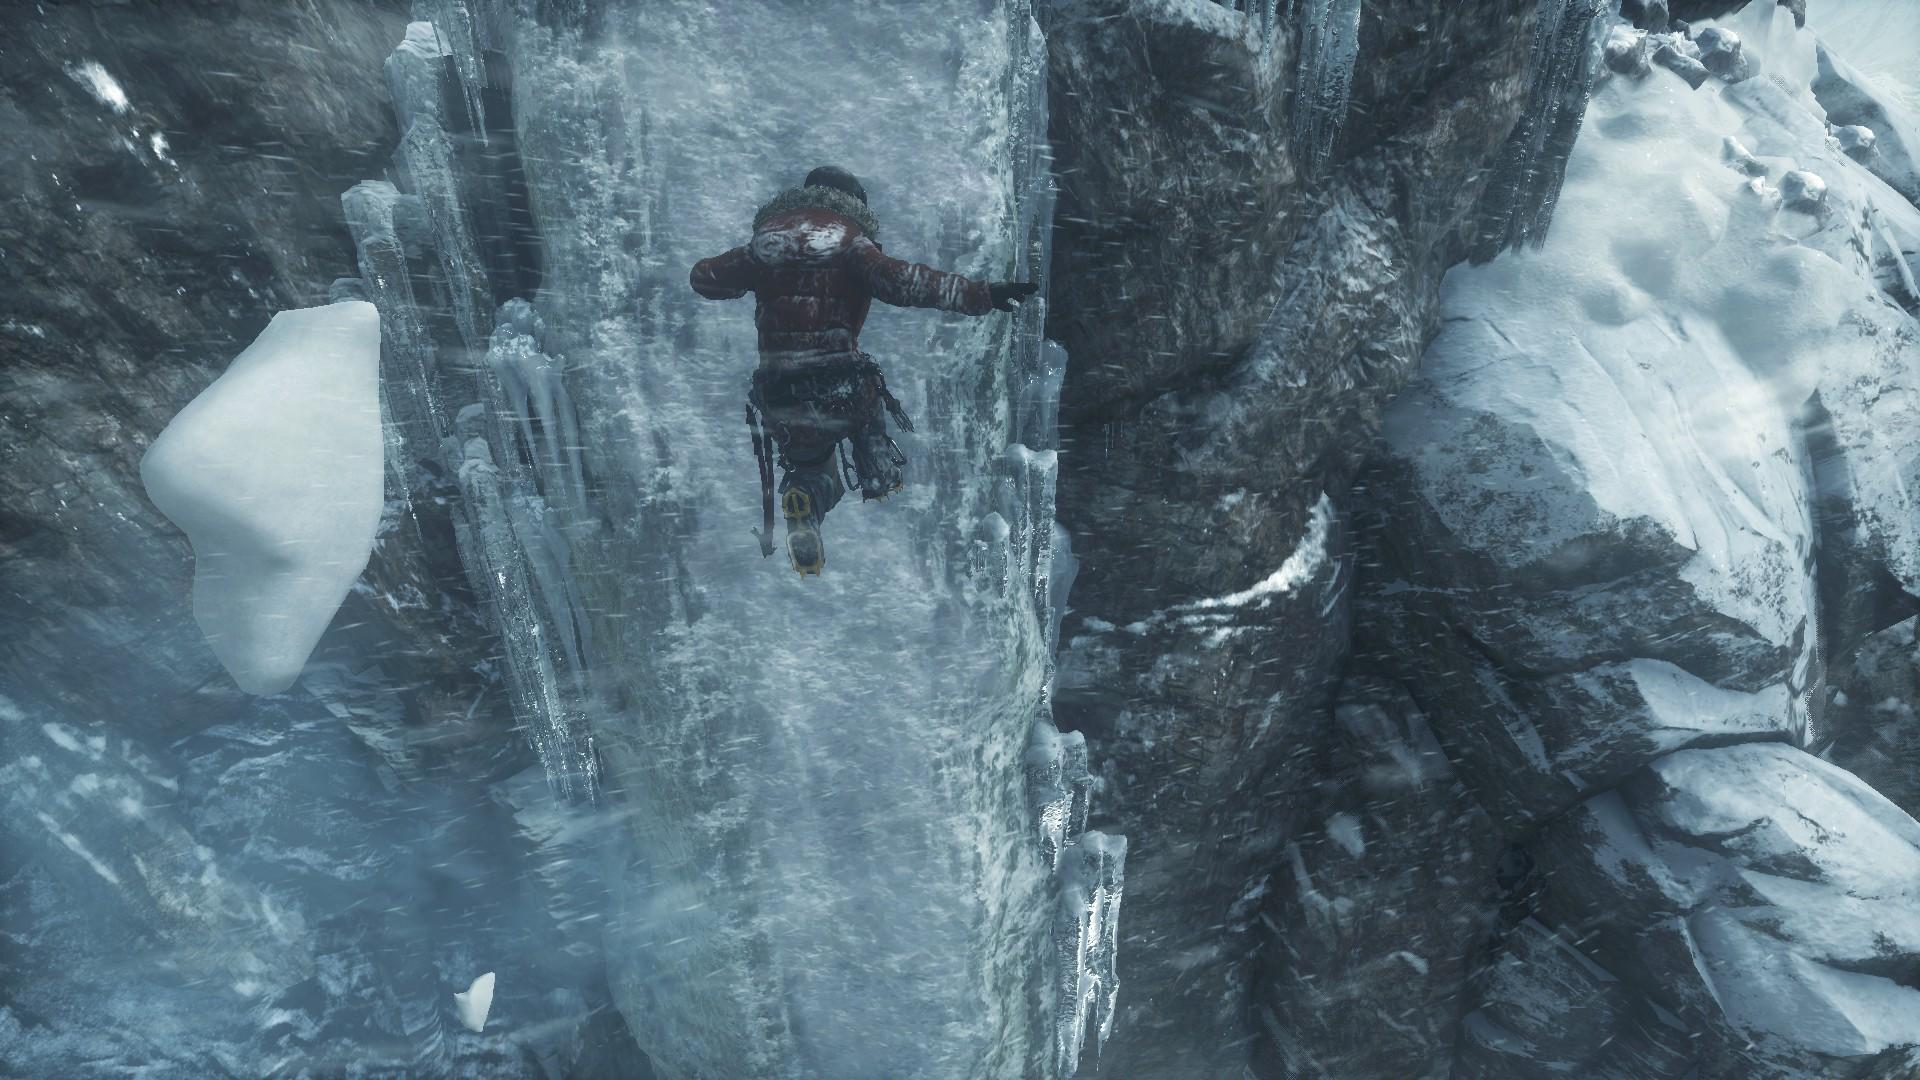 20171203195540_1.jpg - Rise of the Tomb Raider